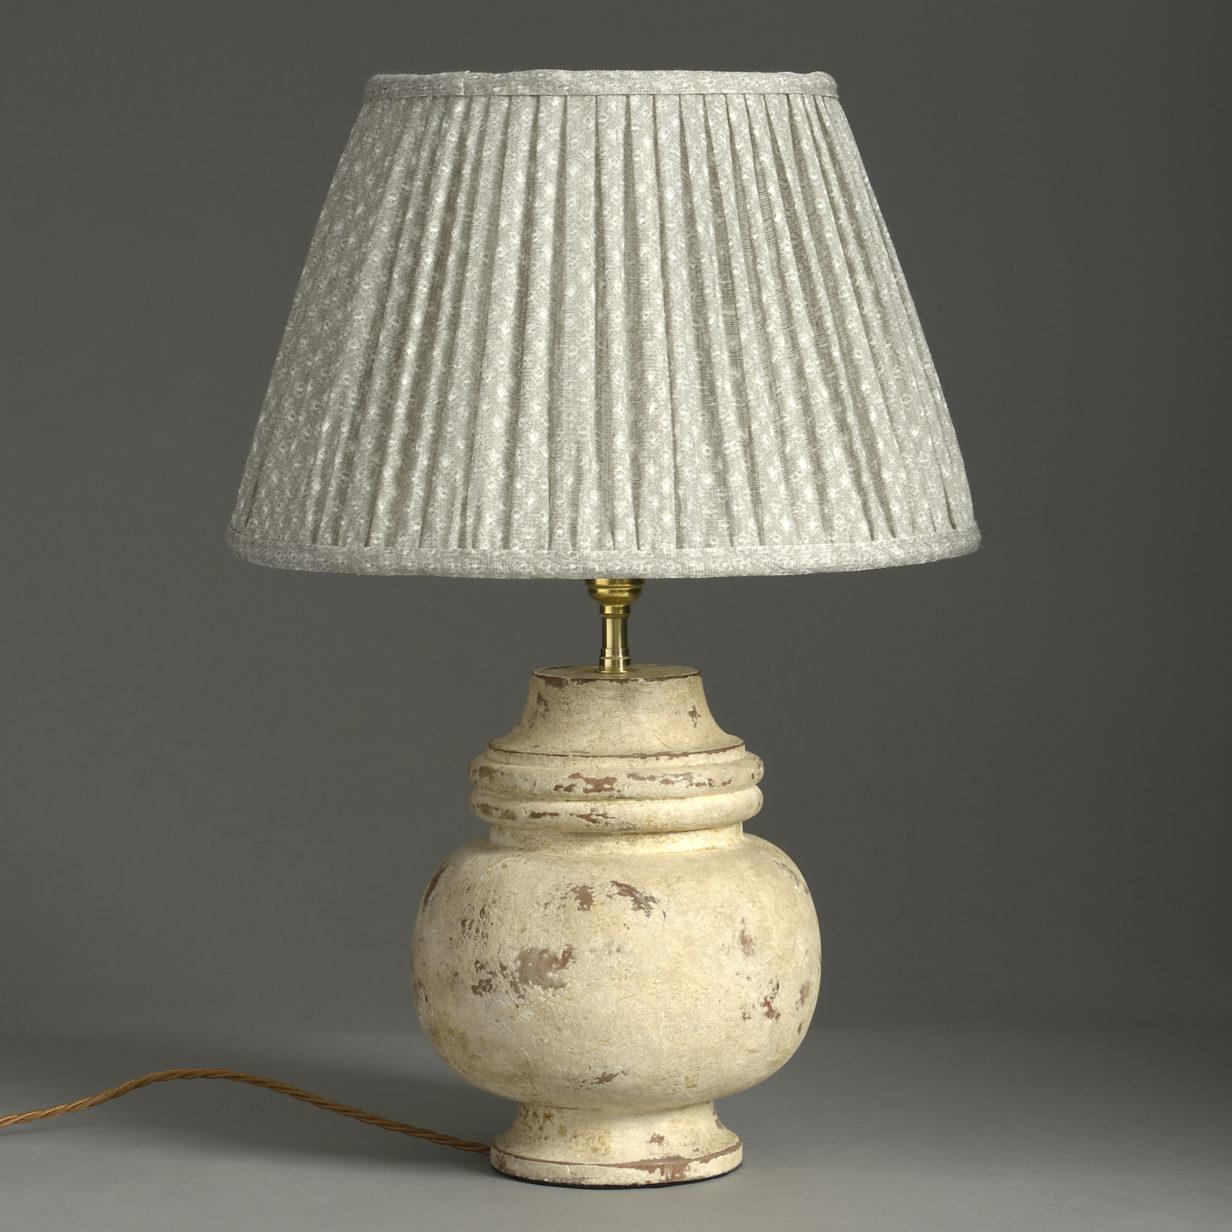 Bulbous Lamp